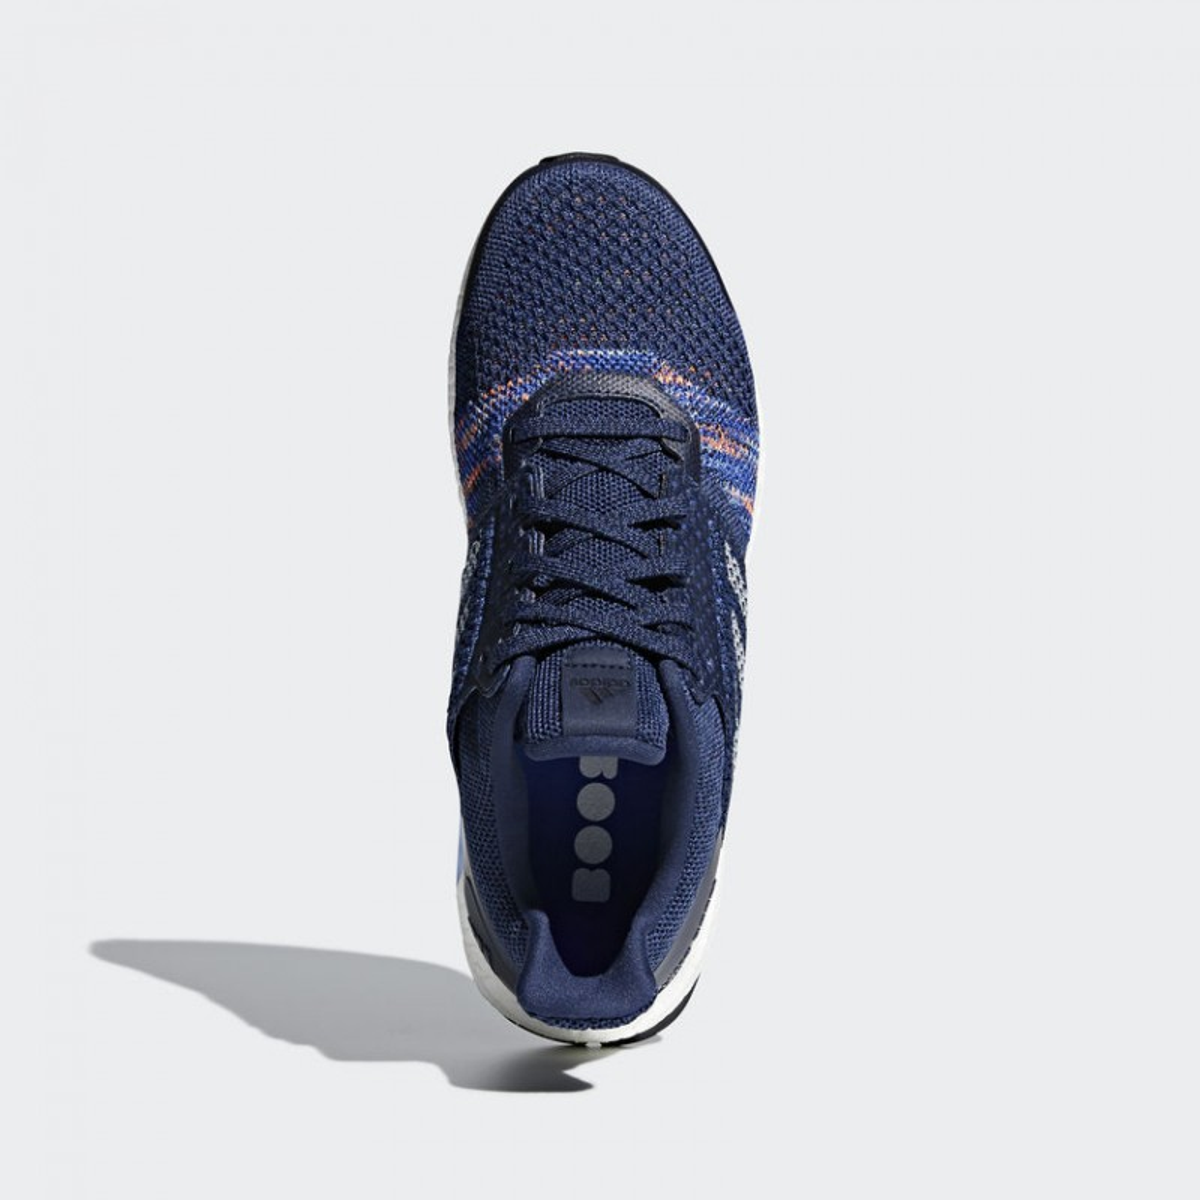 hot sale online 05c13 b4b06 ... Zapatillas Adidas Ultra Boost azul marino Hombre PV18 ...